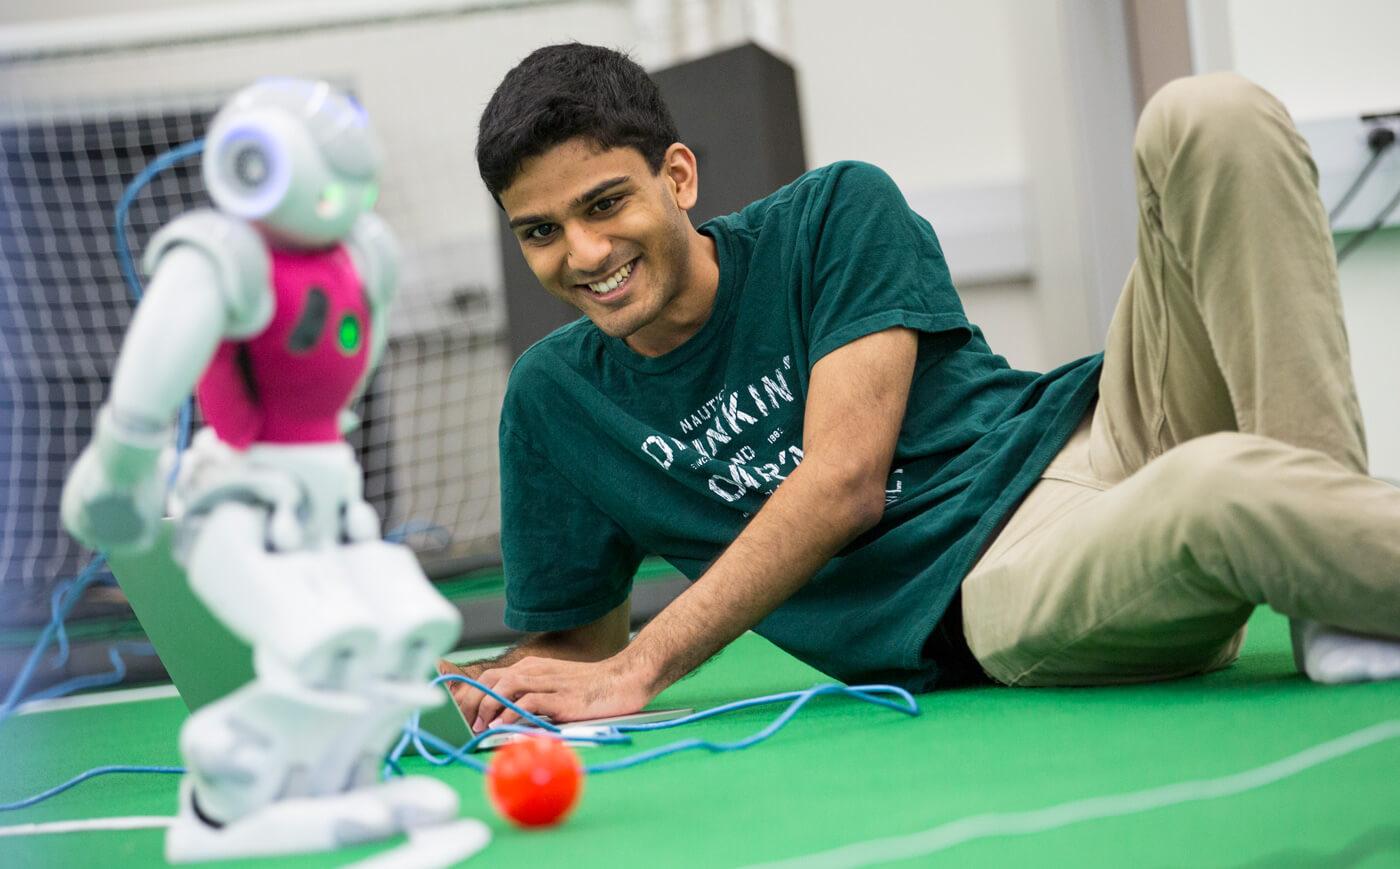 Student doing robotics